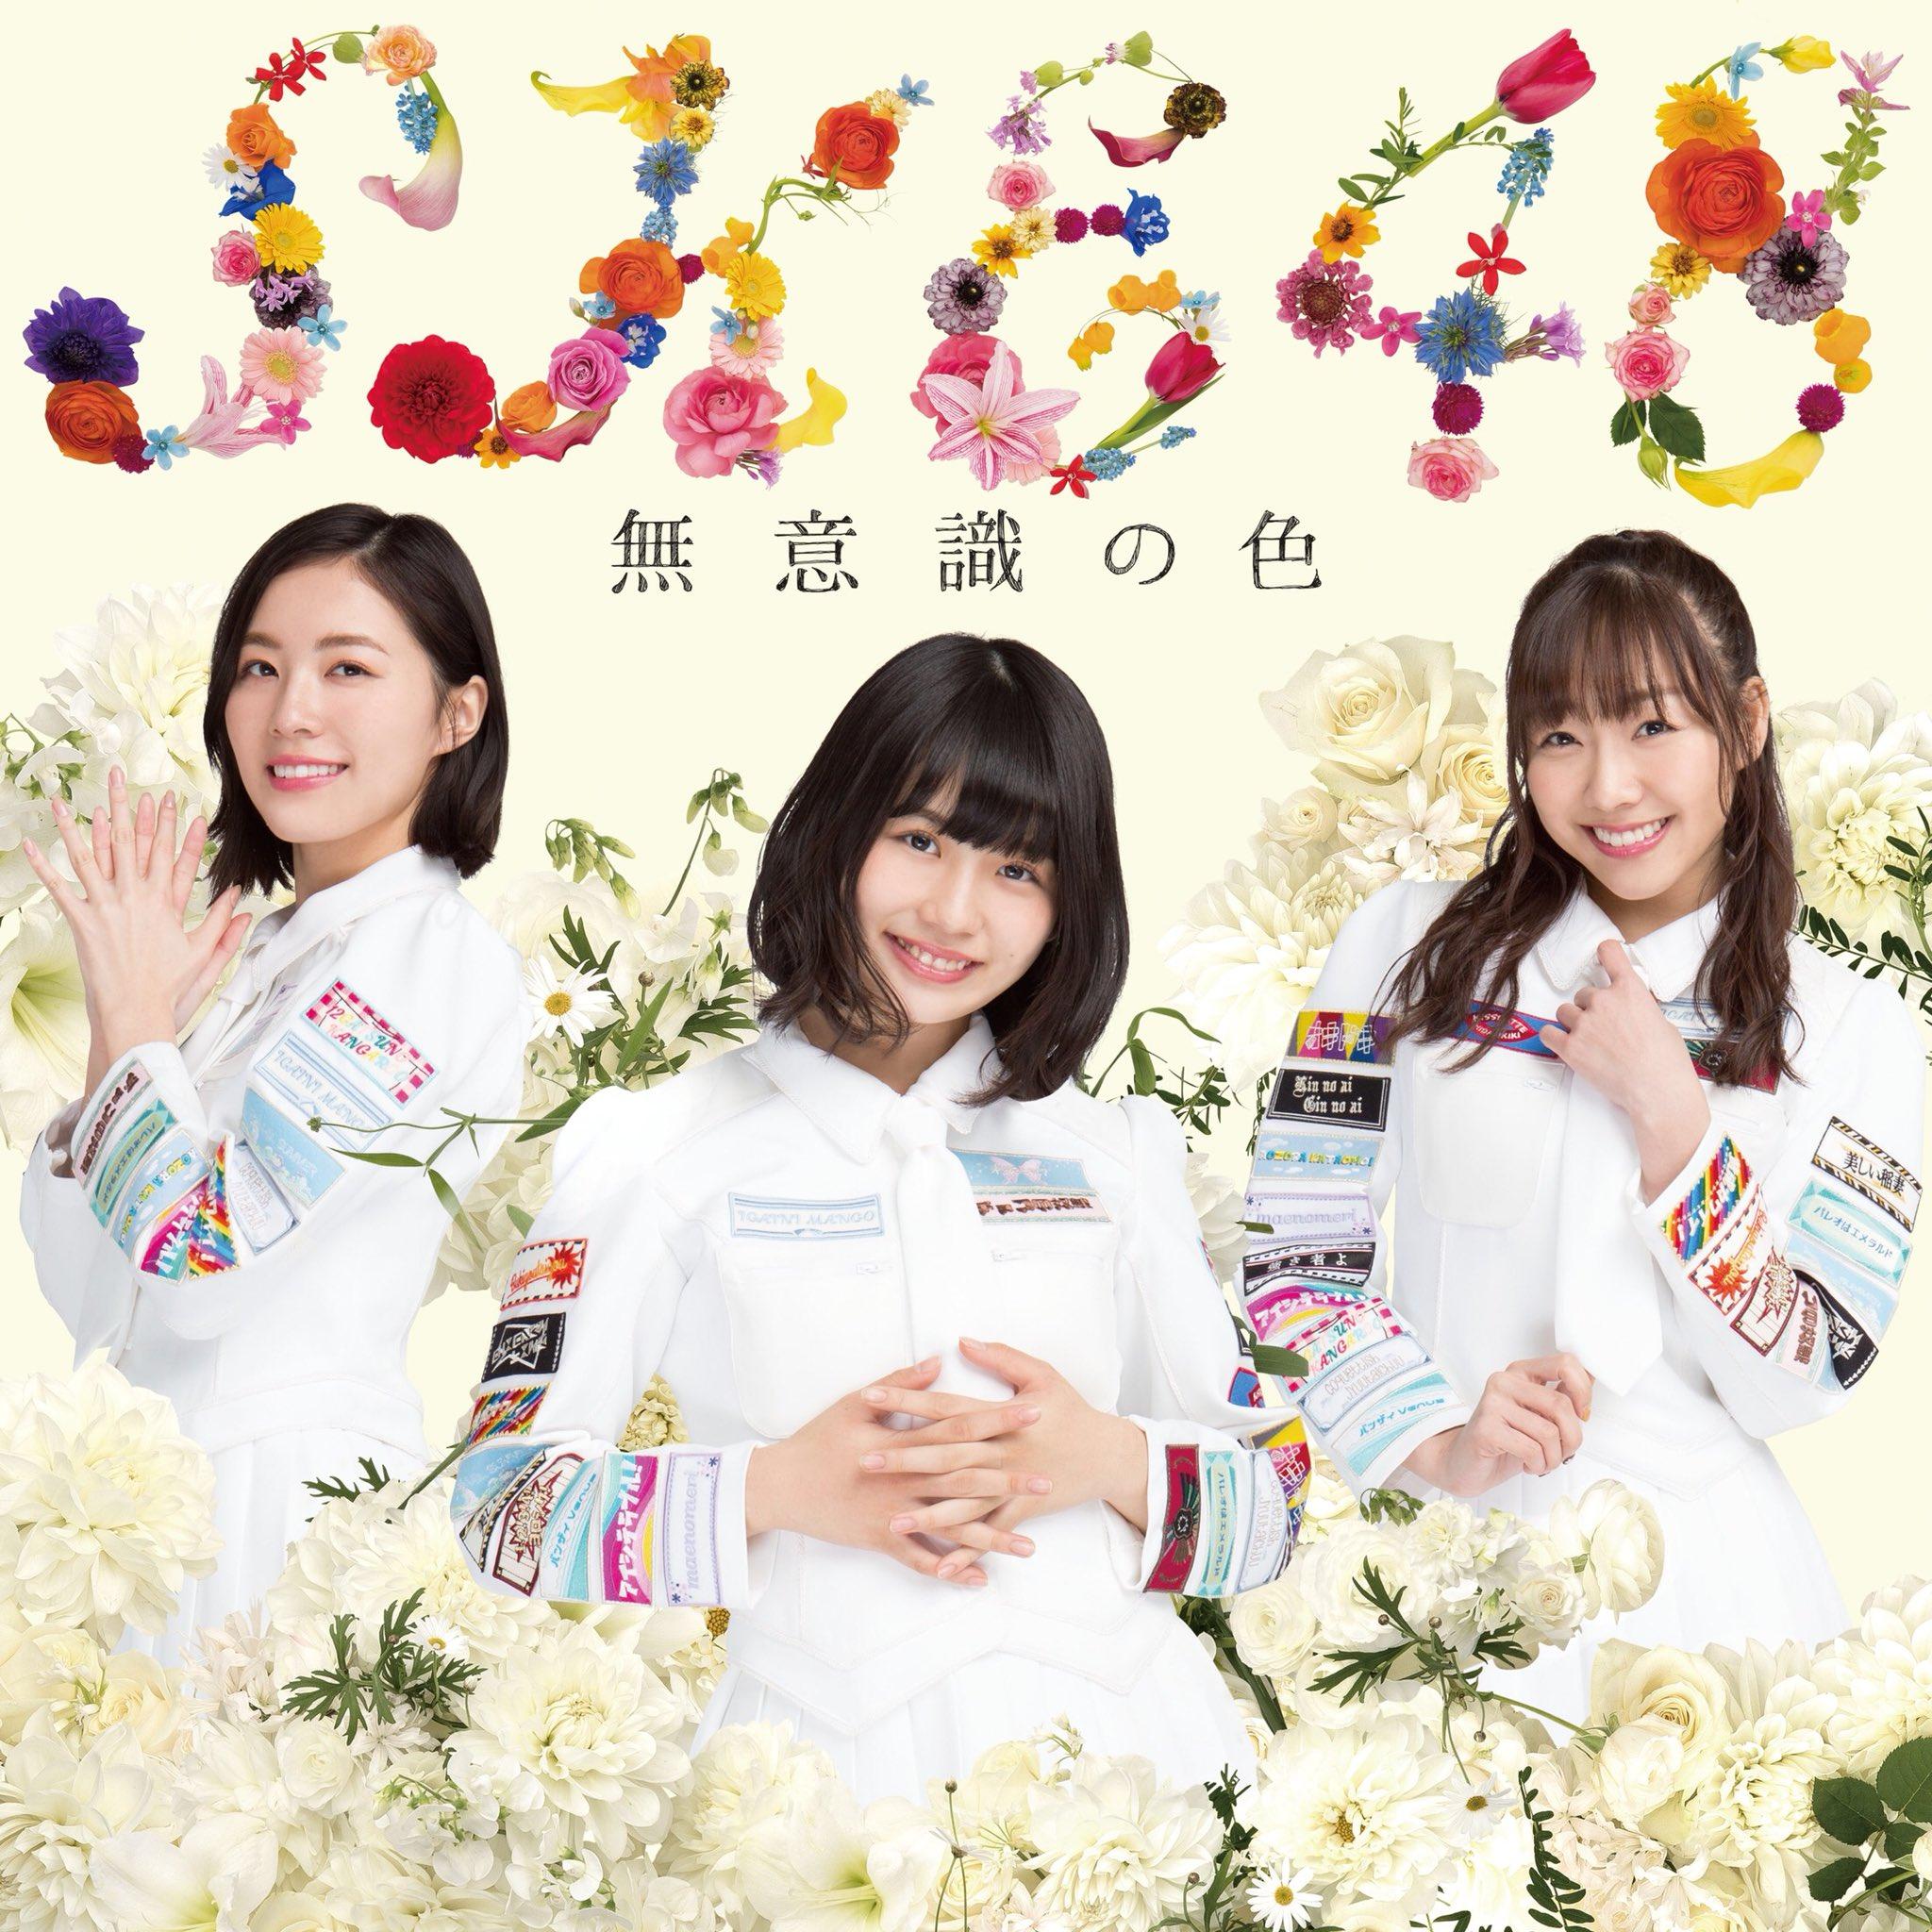 SKE48「無意識の色」1月20日の全国握手会@名古屋が開催延期「参加メンバーの確約が大変難しい状況」